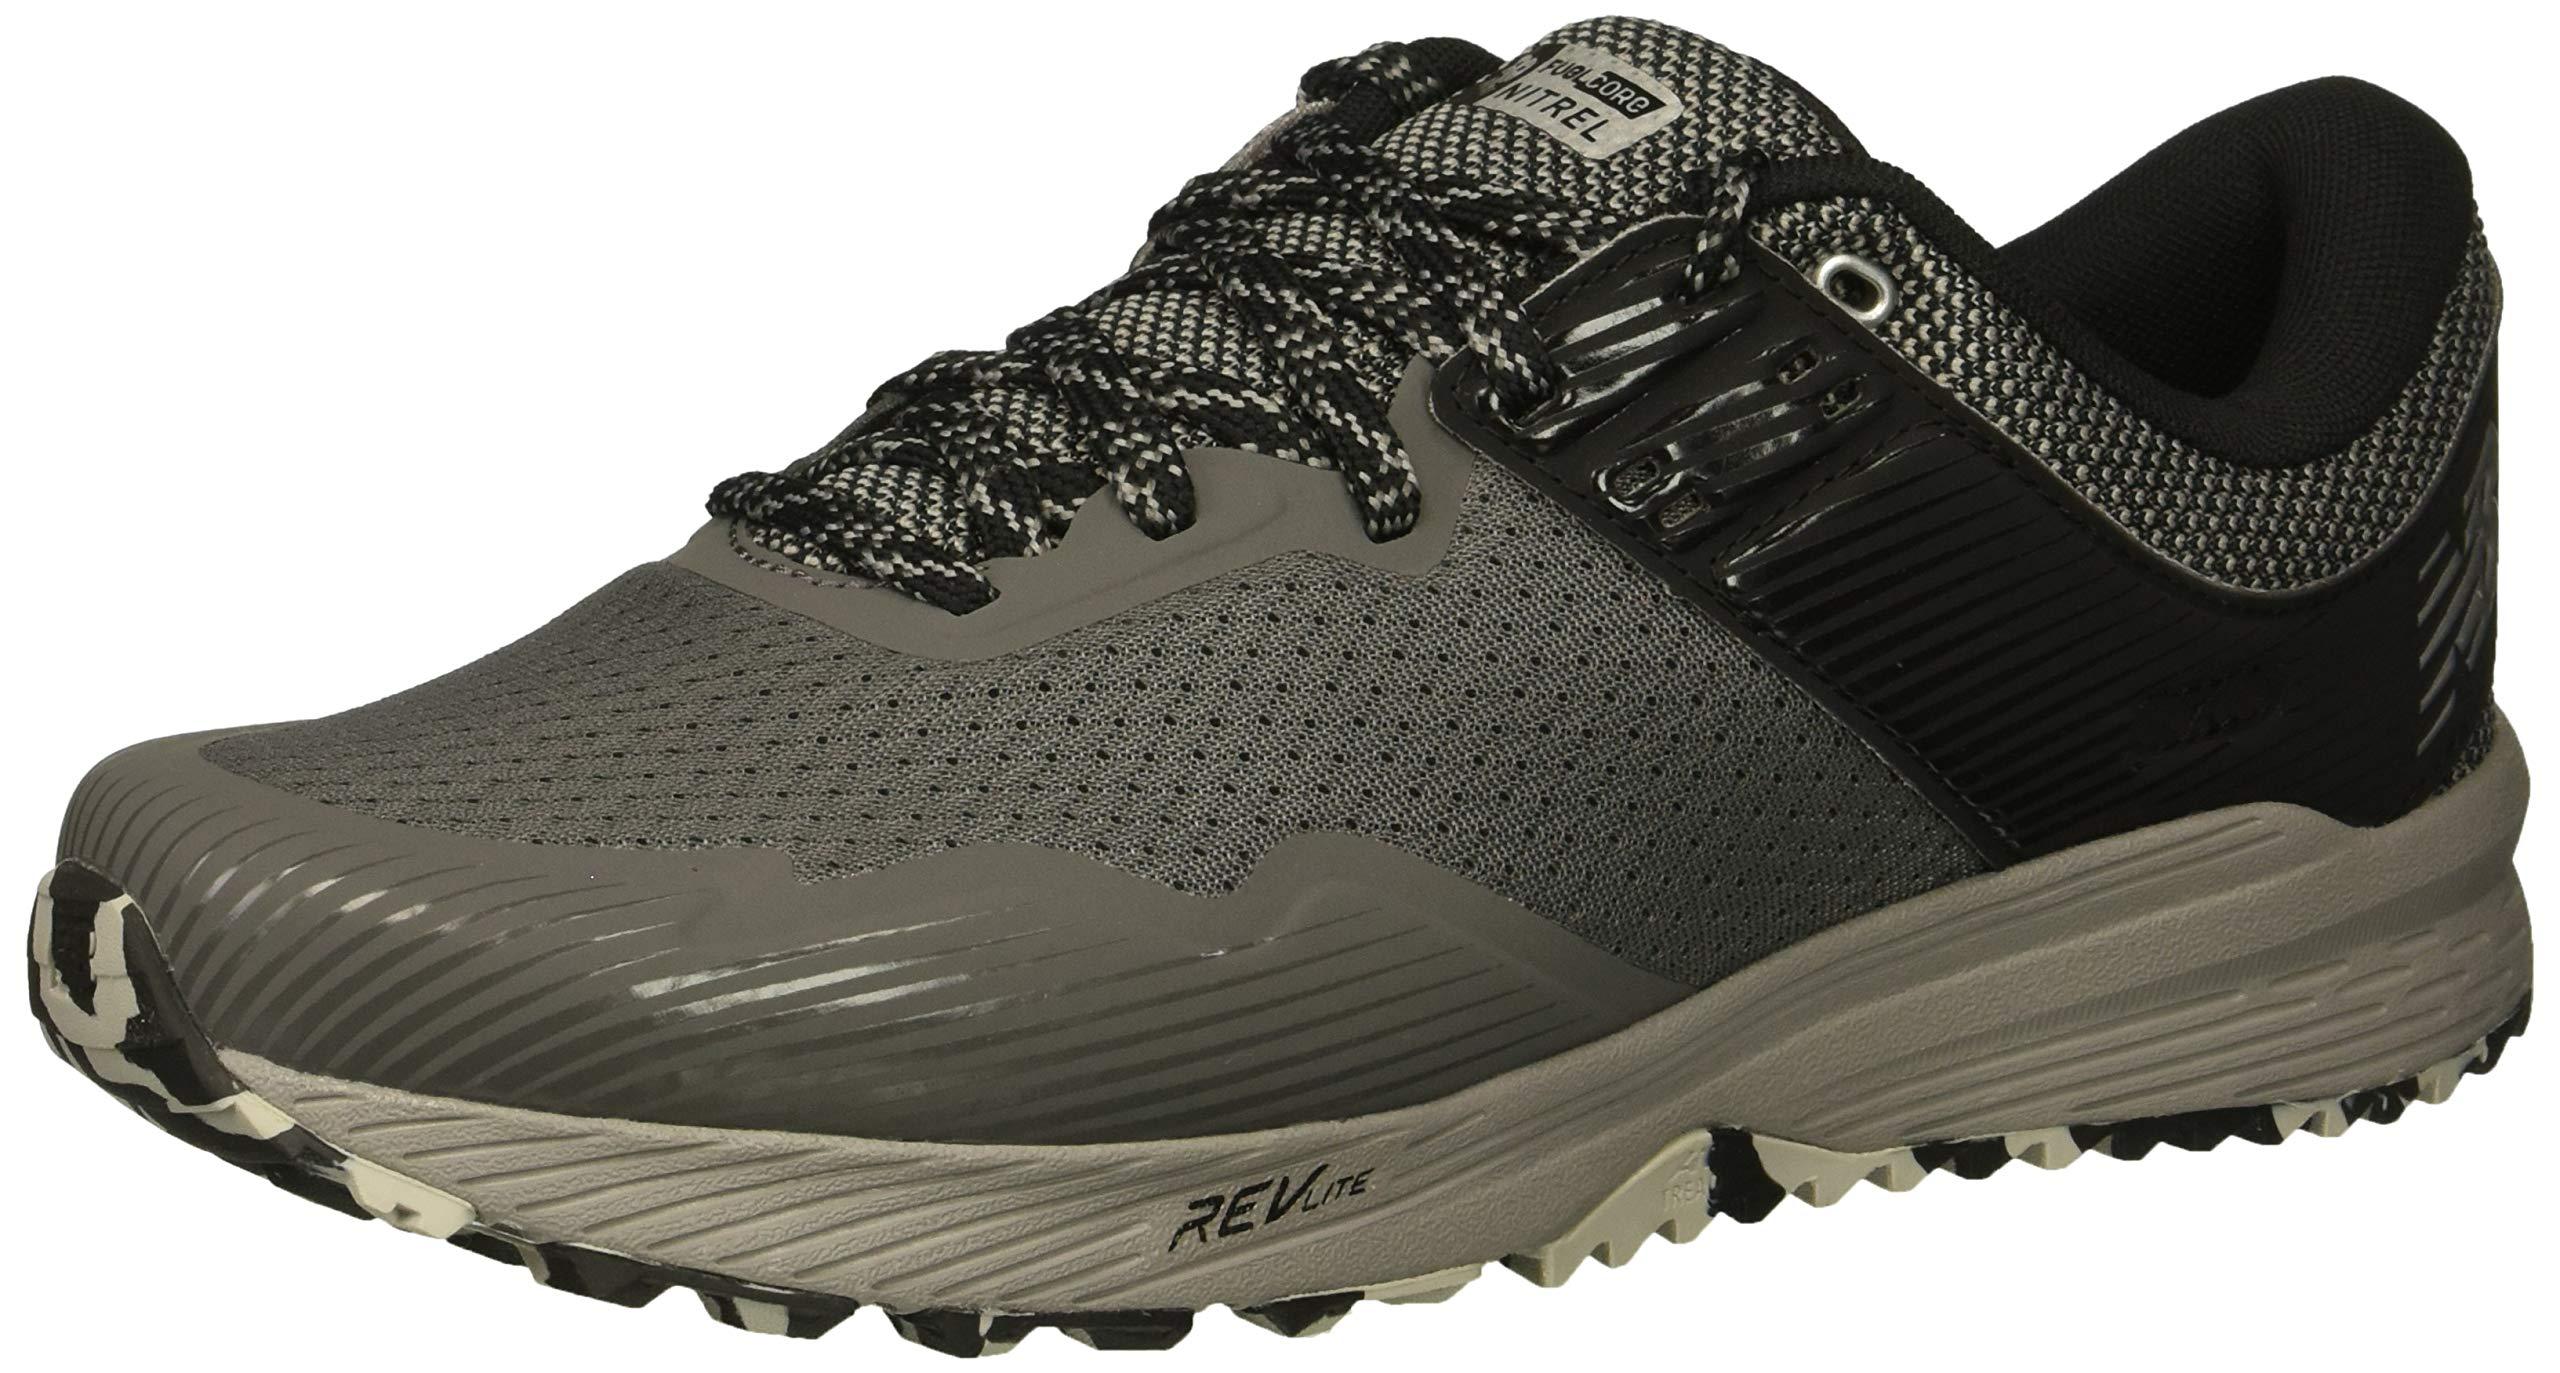 New Balance Men's Nitrel V2 FuelCore Trail Running Shoe, Castlerock/Black/Silver, 7.5 D US